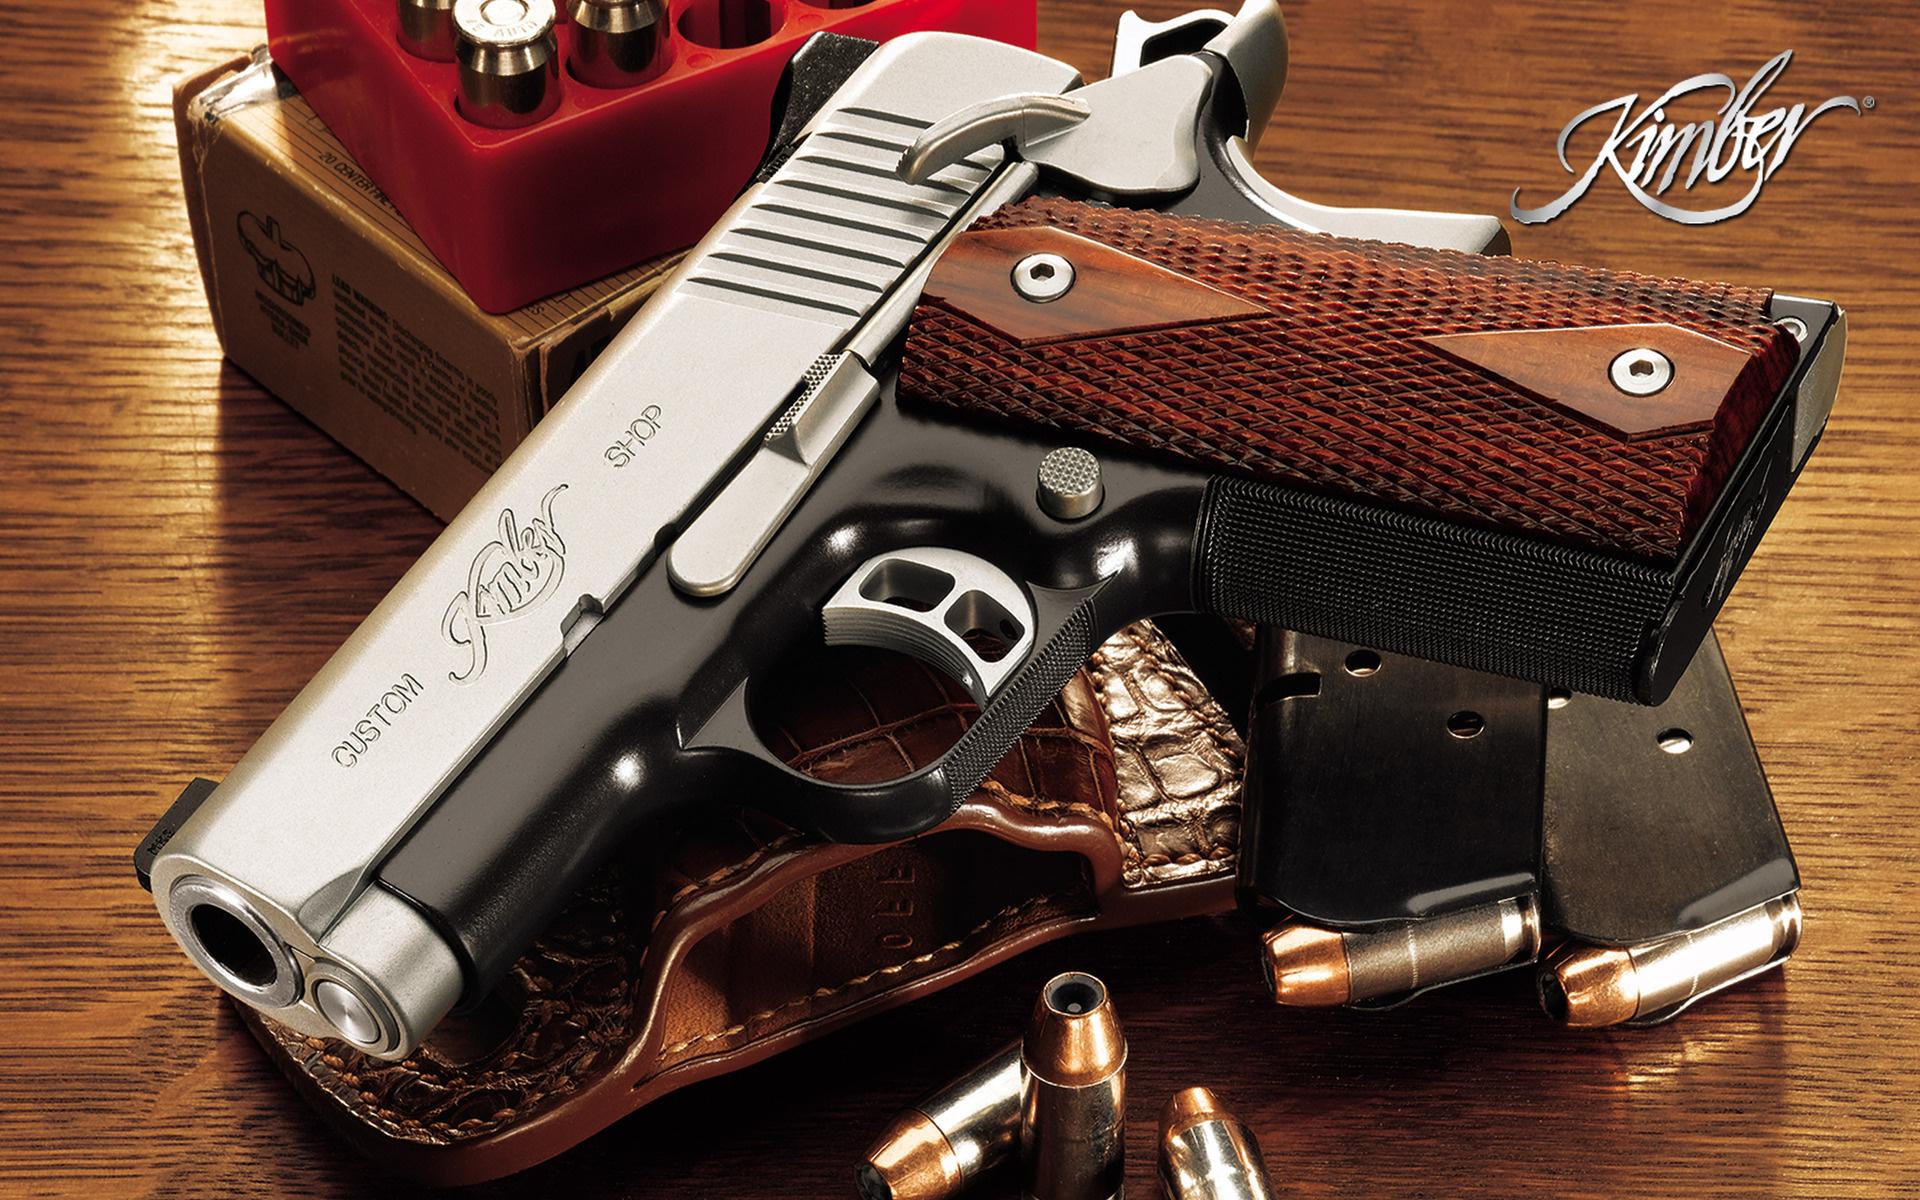 Kimber Pistol Full Hd Wallpaper And Background Image